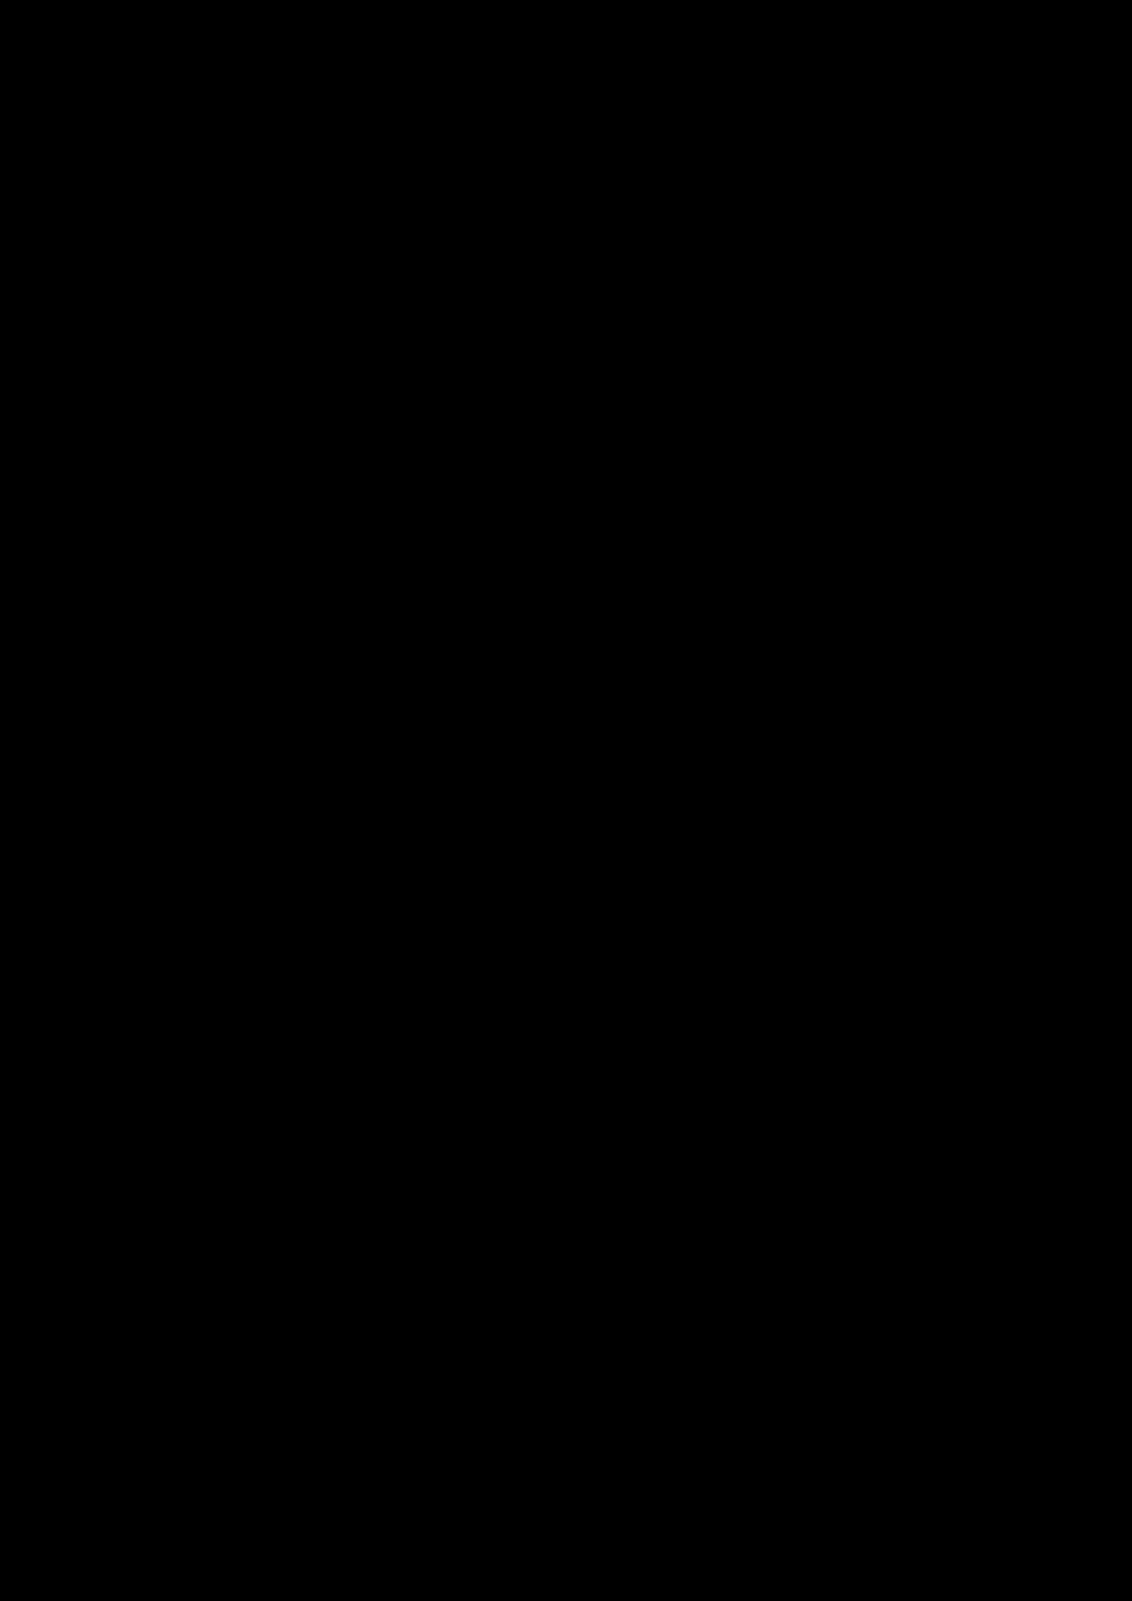 Ispoved Pervogo Boga slide, Image 3